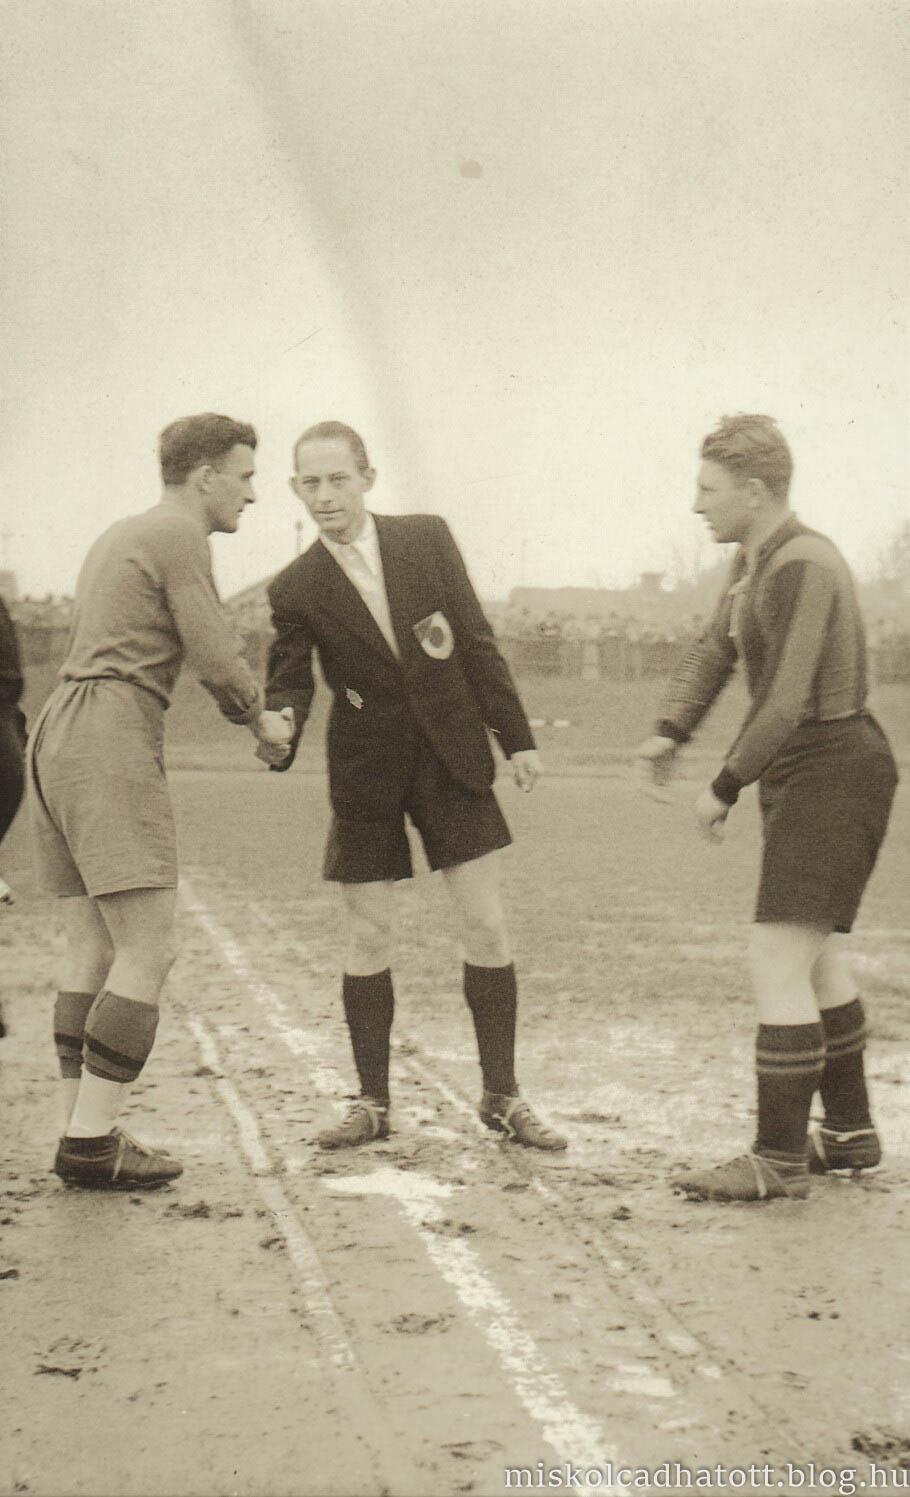 85_253_62_1_labdarugo_merkozes_a_diosgyori_stadionban_1939-44.jpg